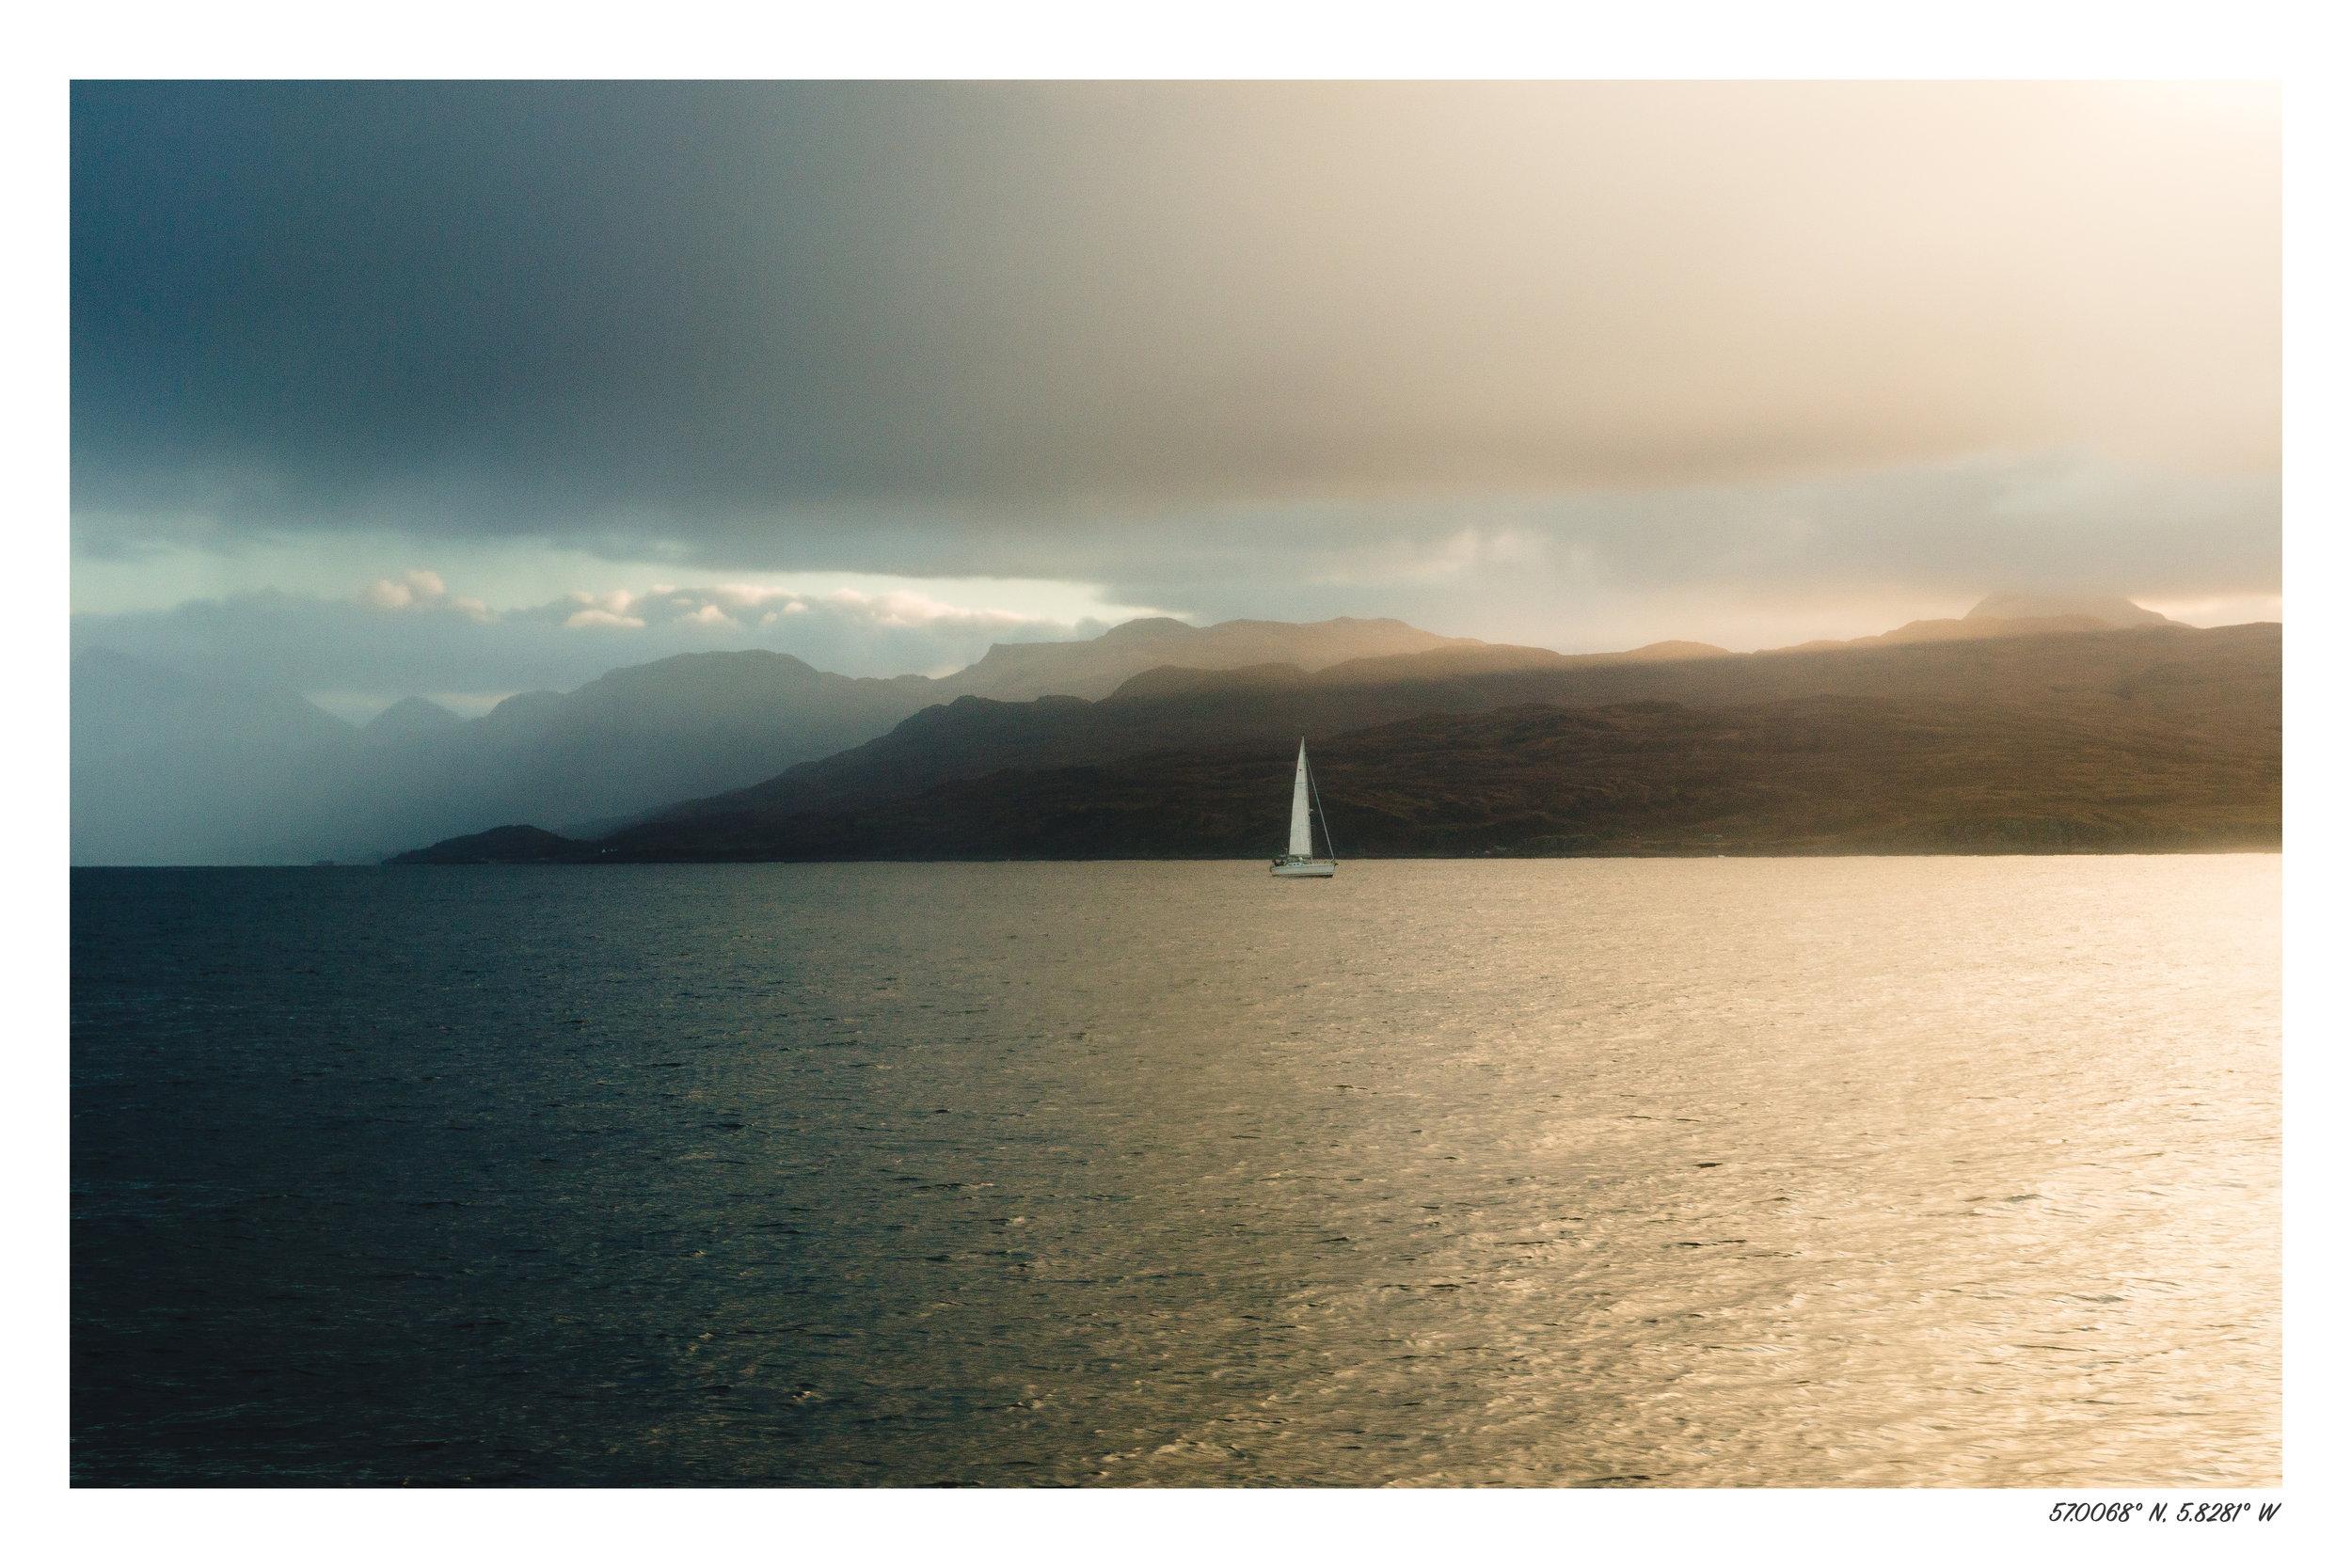 From malaig to Skye.jpg